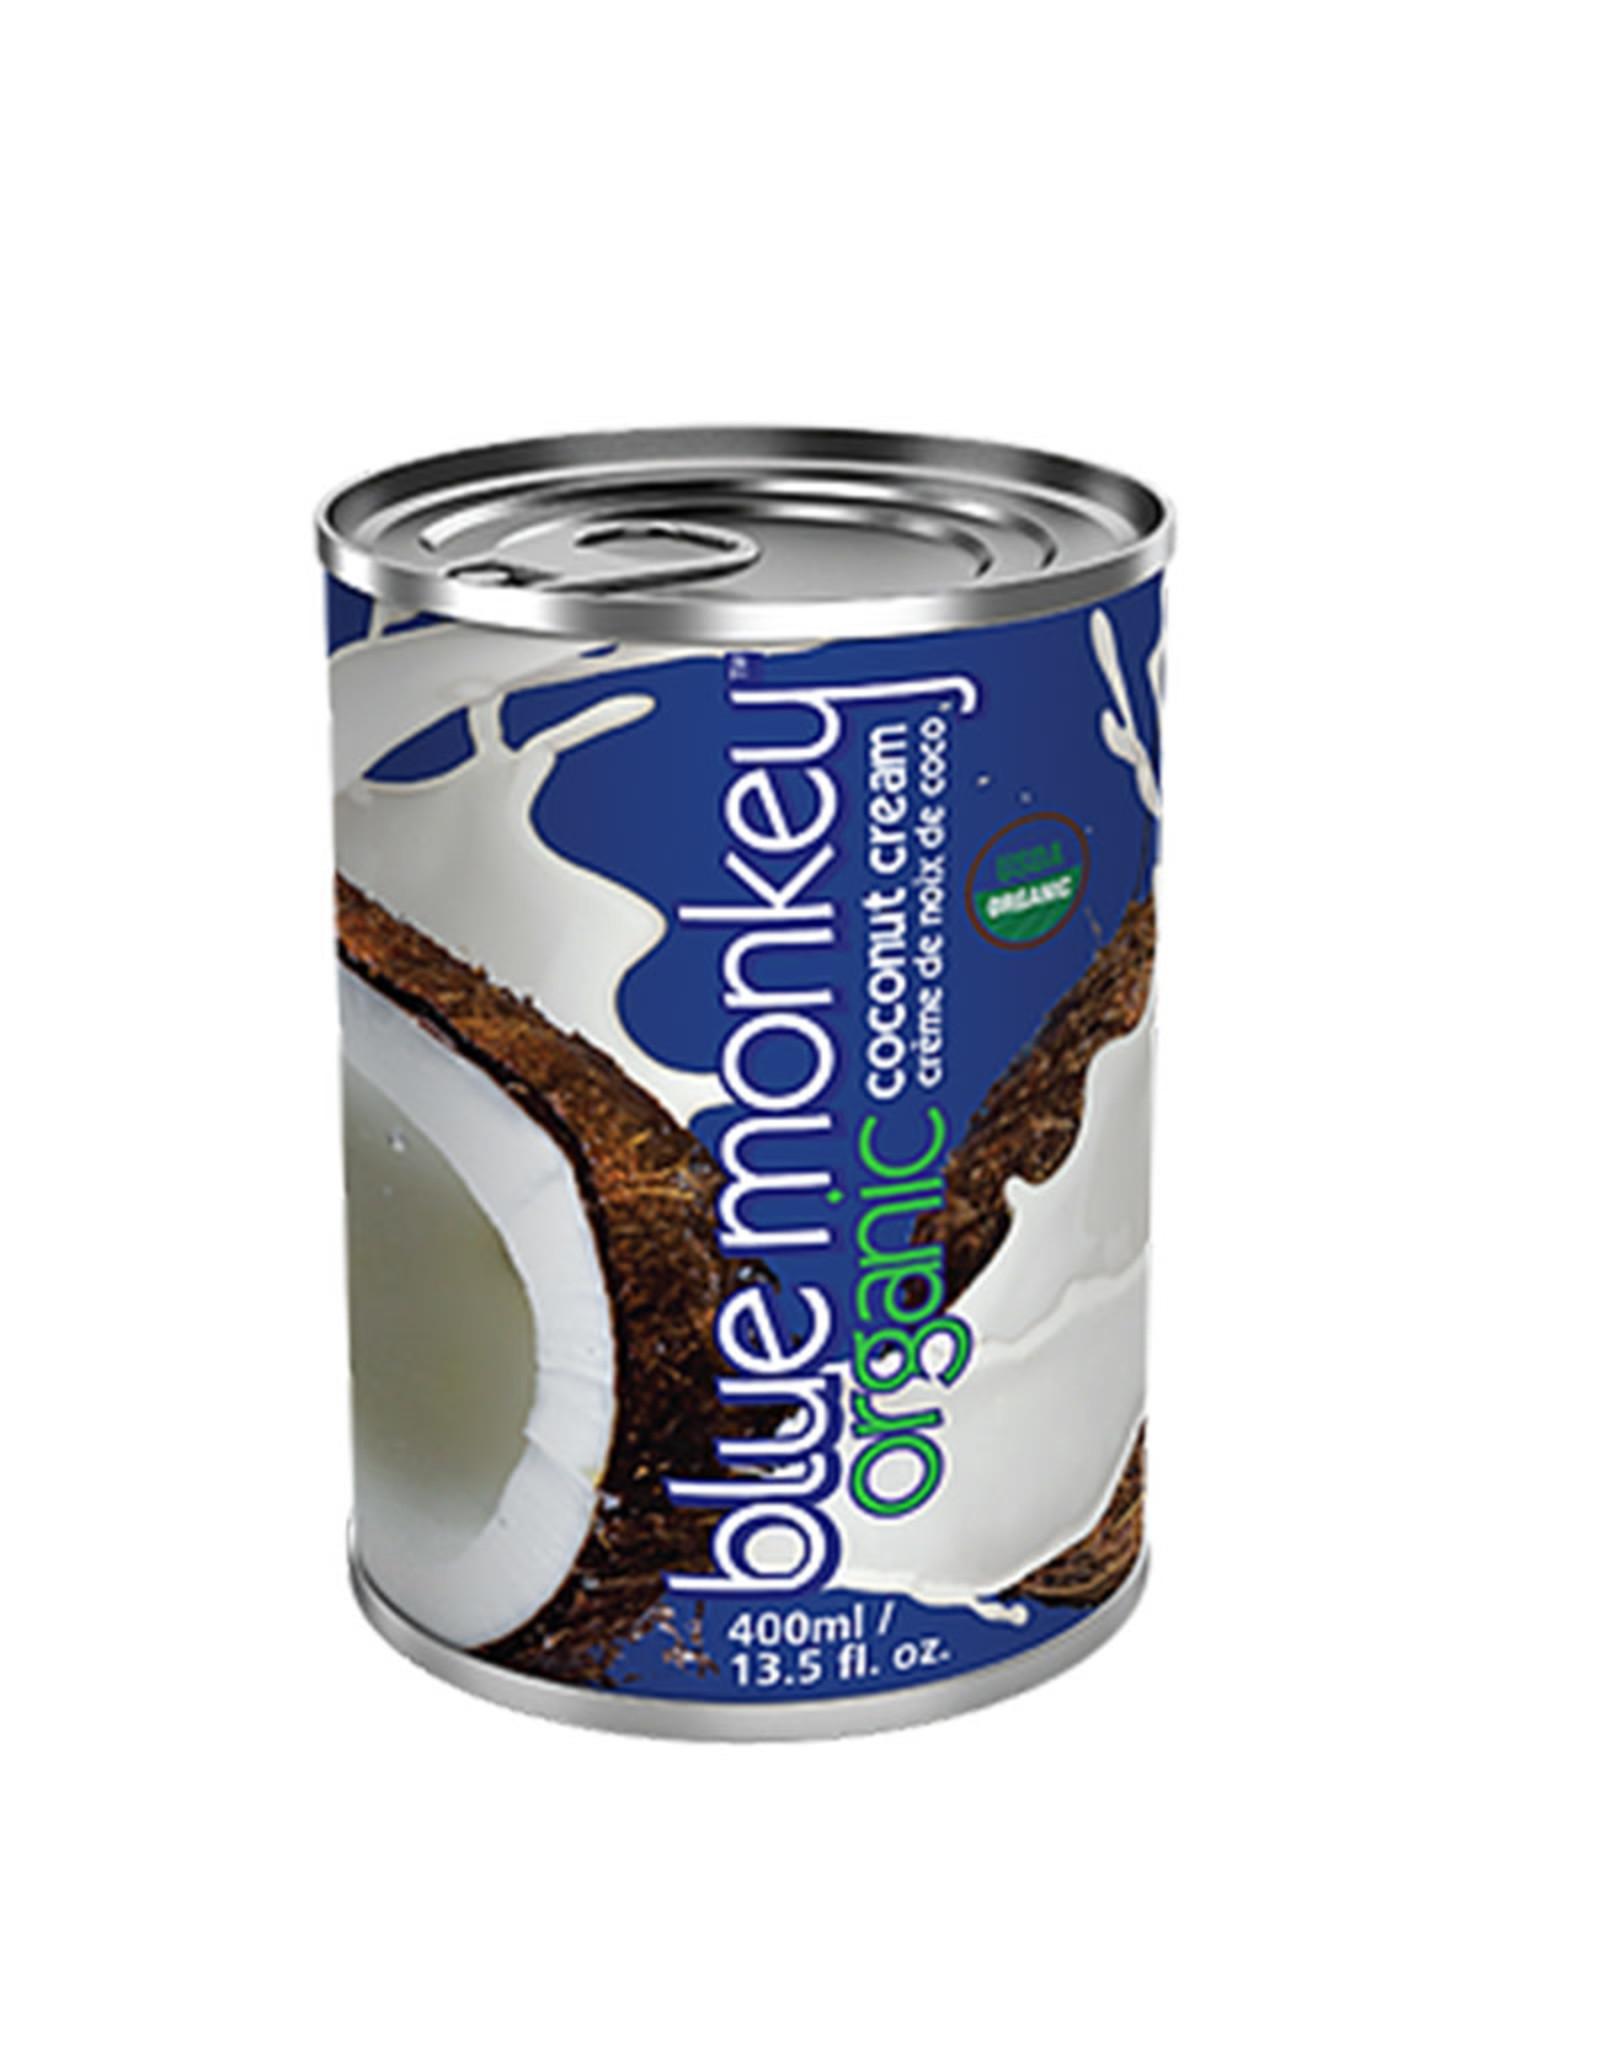 Blue Monkey Blue Monkey - Organic Coconut Cream (400ml)